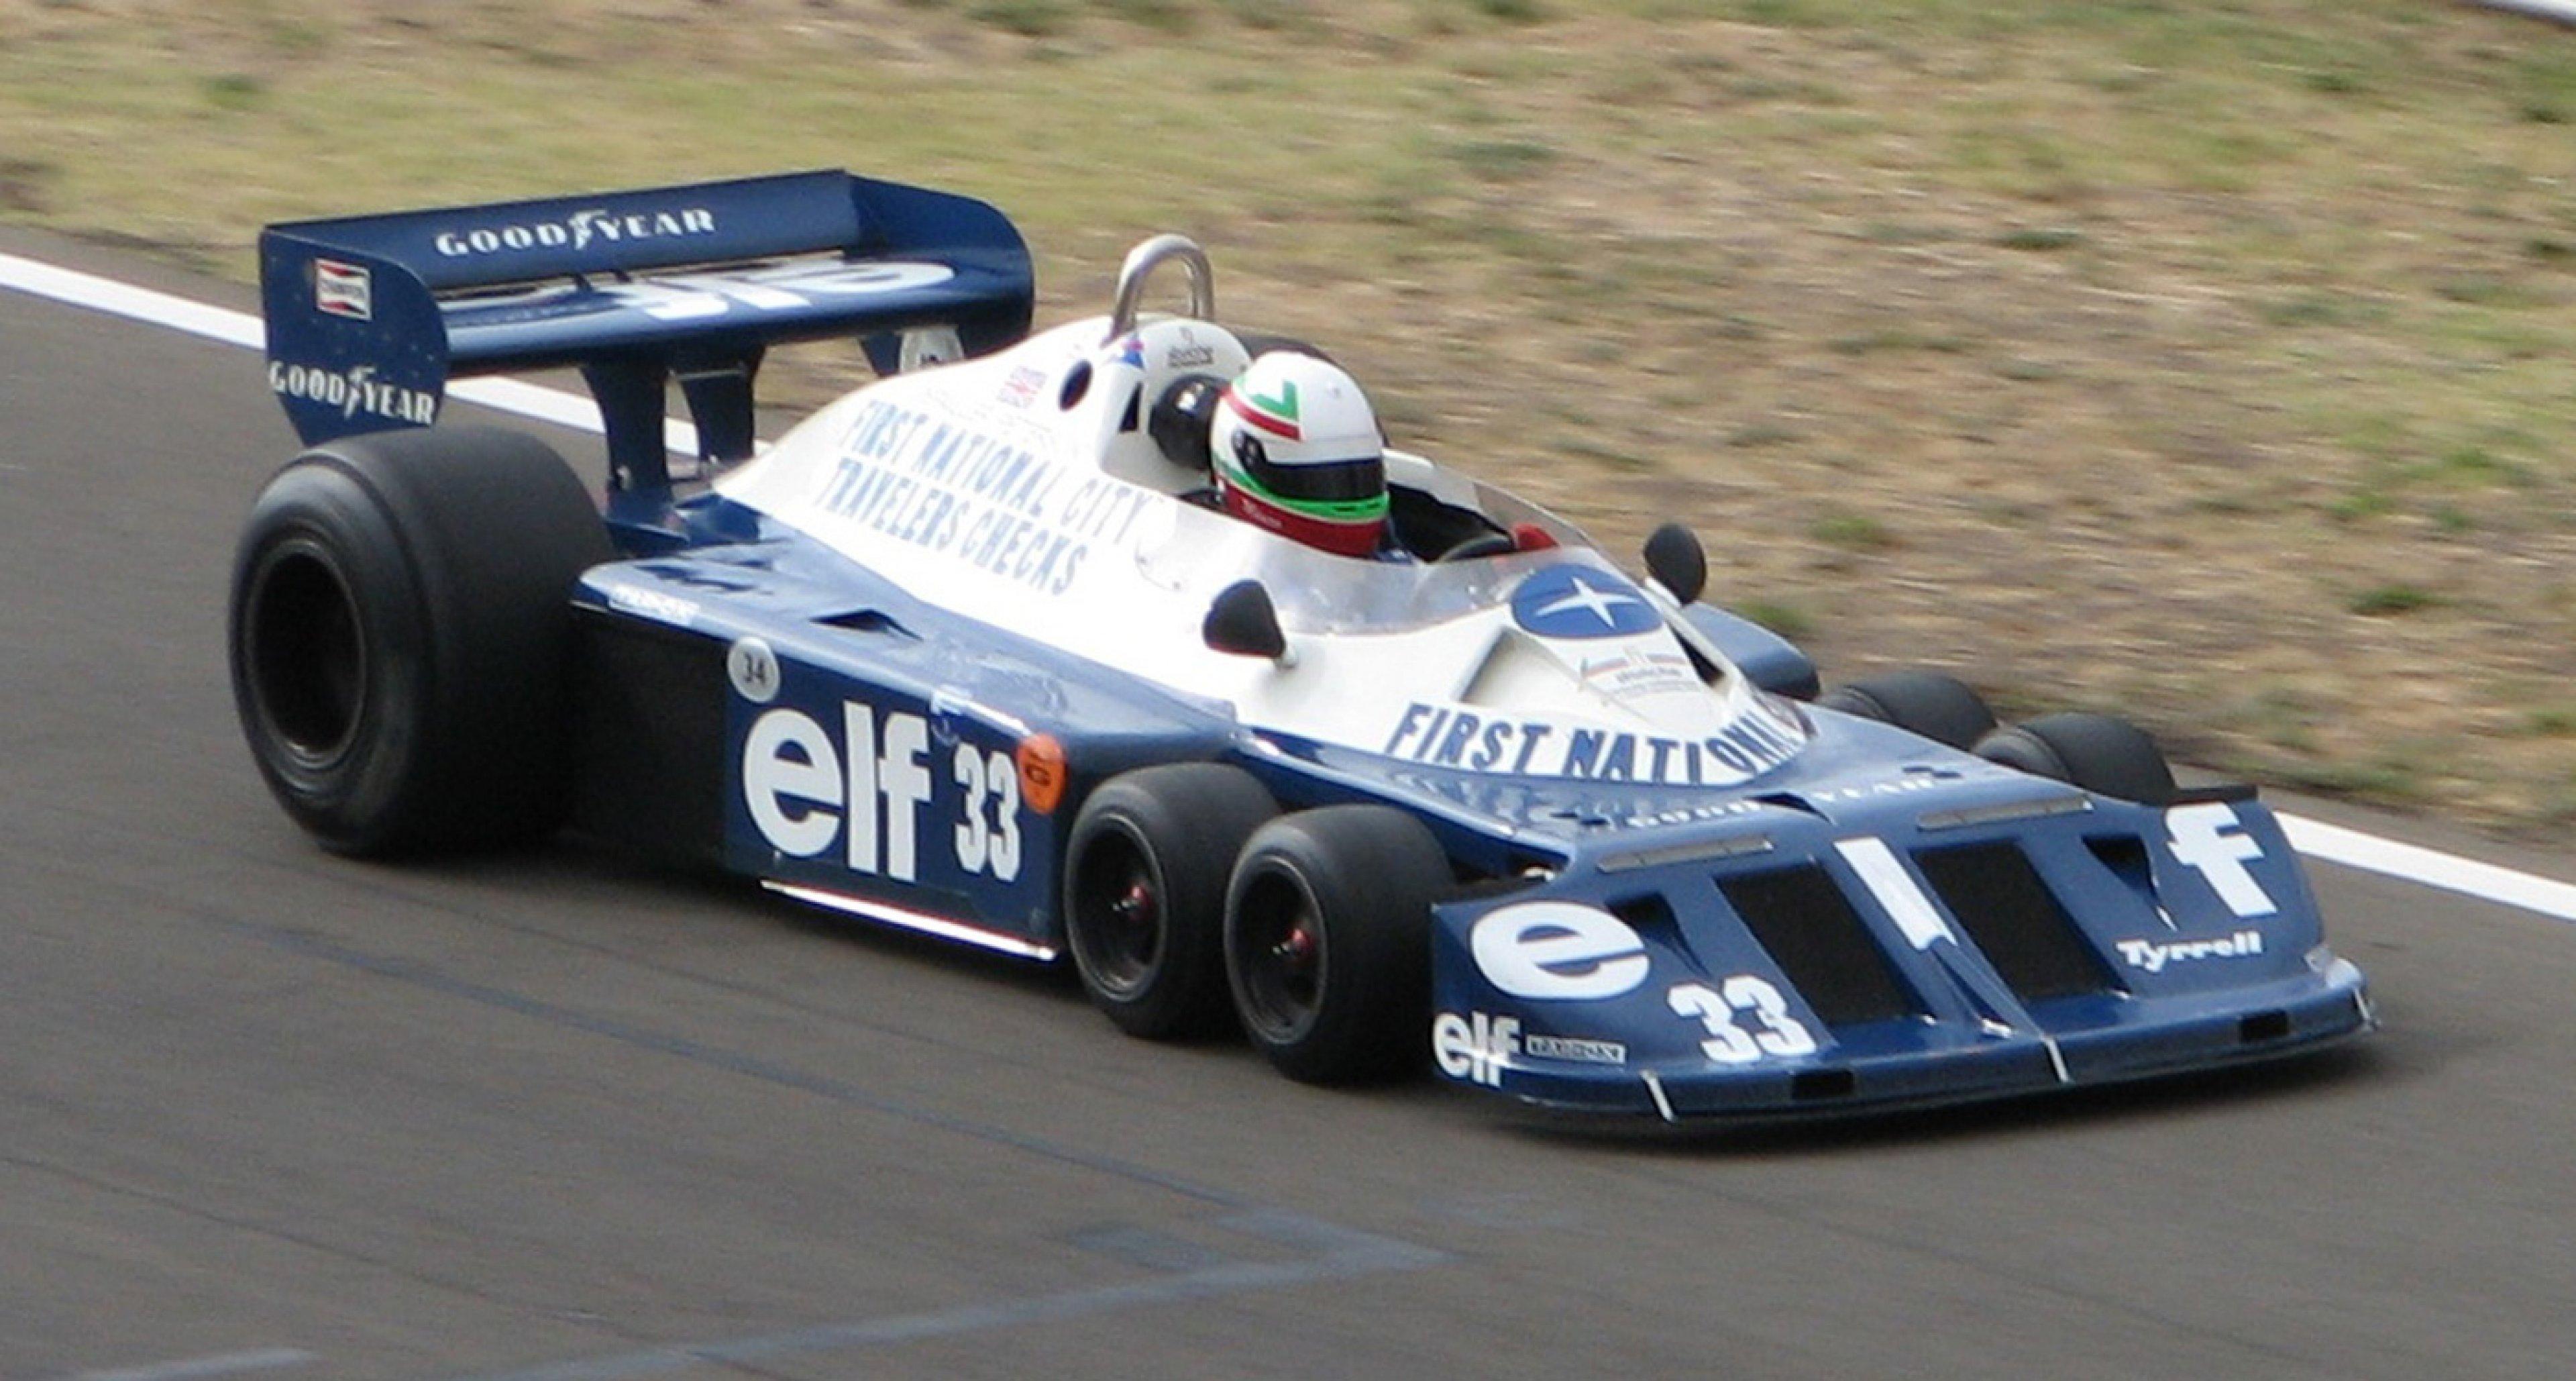 Tyrrell's famous P34 Formula 1 car of 1976